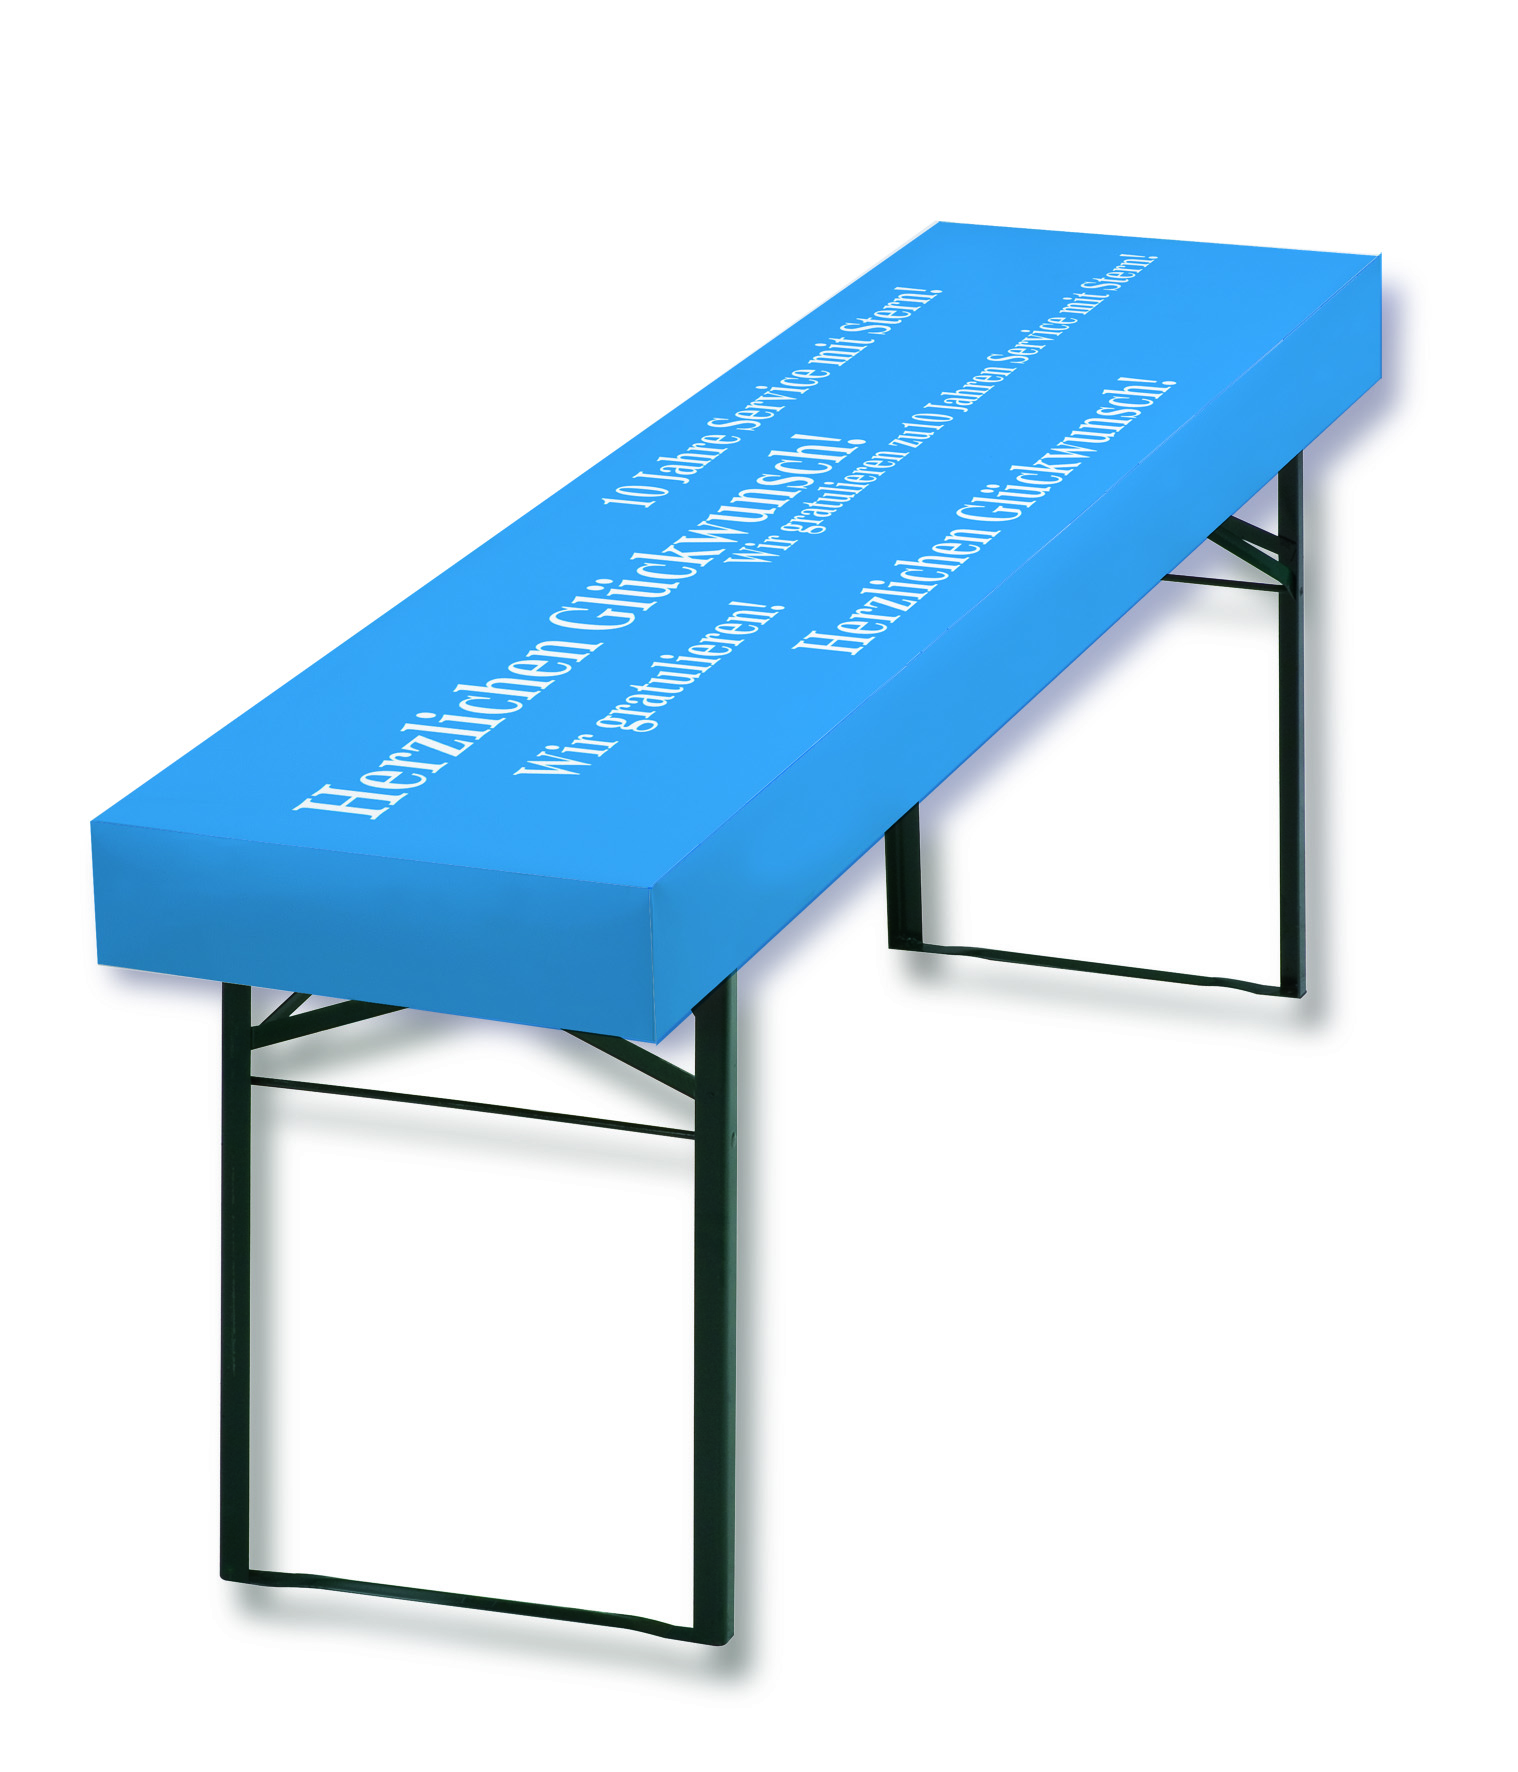 Papiertischdecke, patide, individuell bedruckt, your message, Event, Veranstaltung, Biertisch, wasserfest